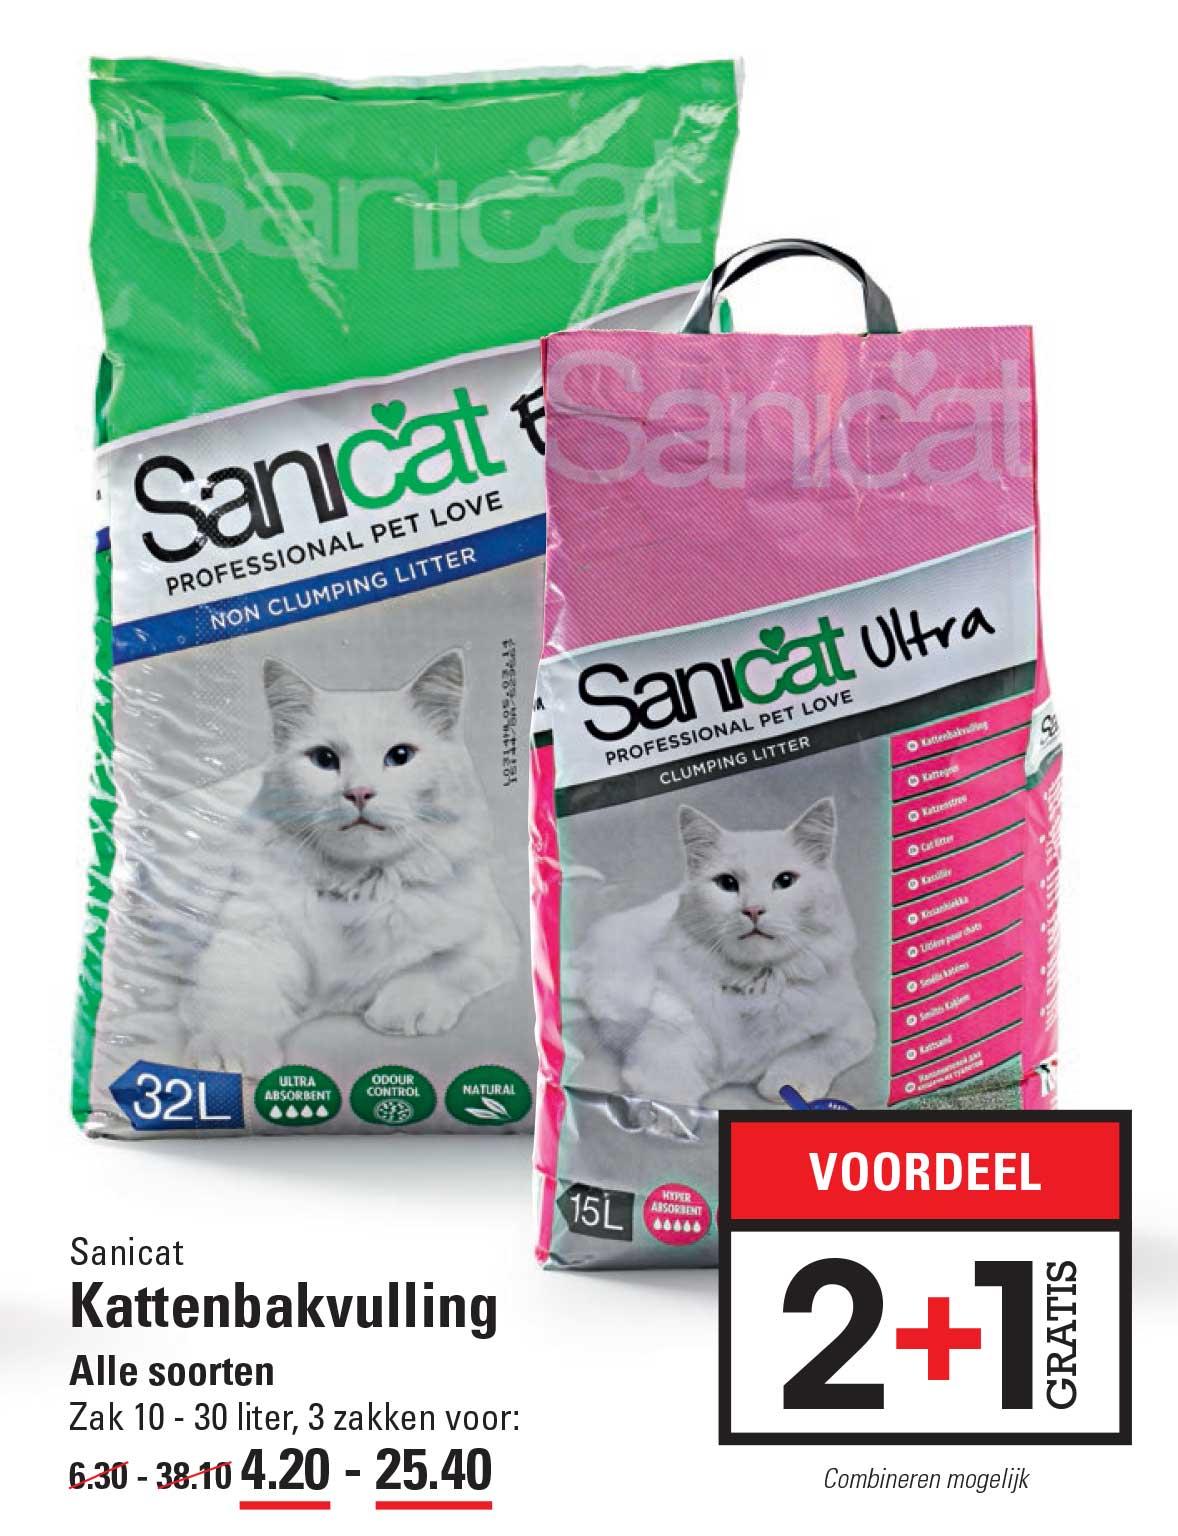 Sligro Sanicat Kattenbakvulling: 2+1 Gratis